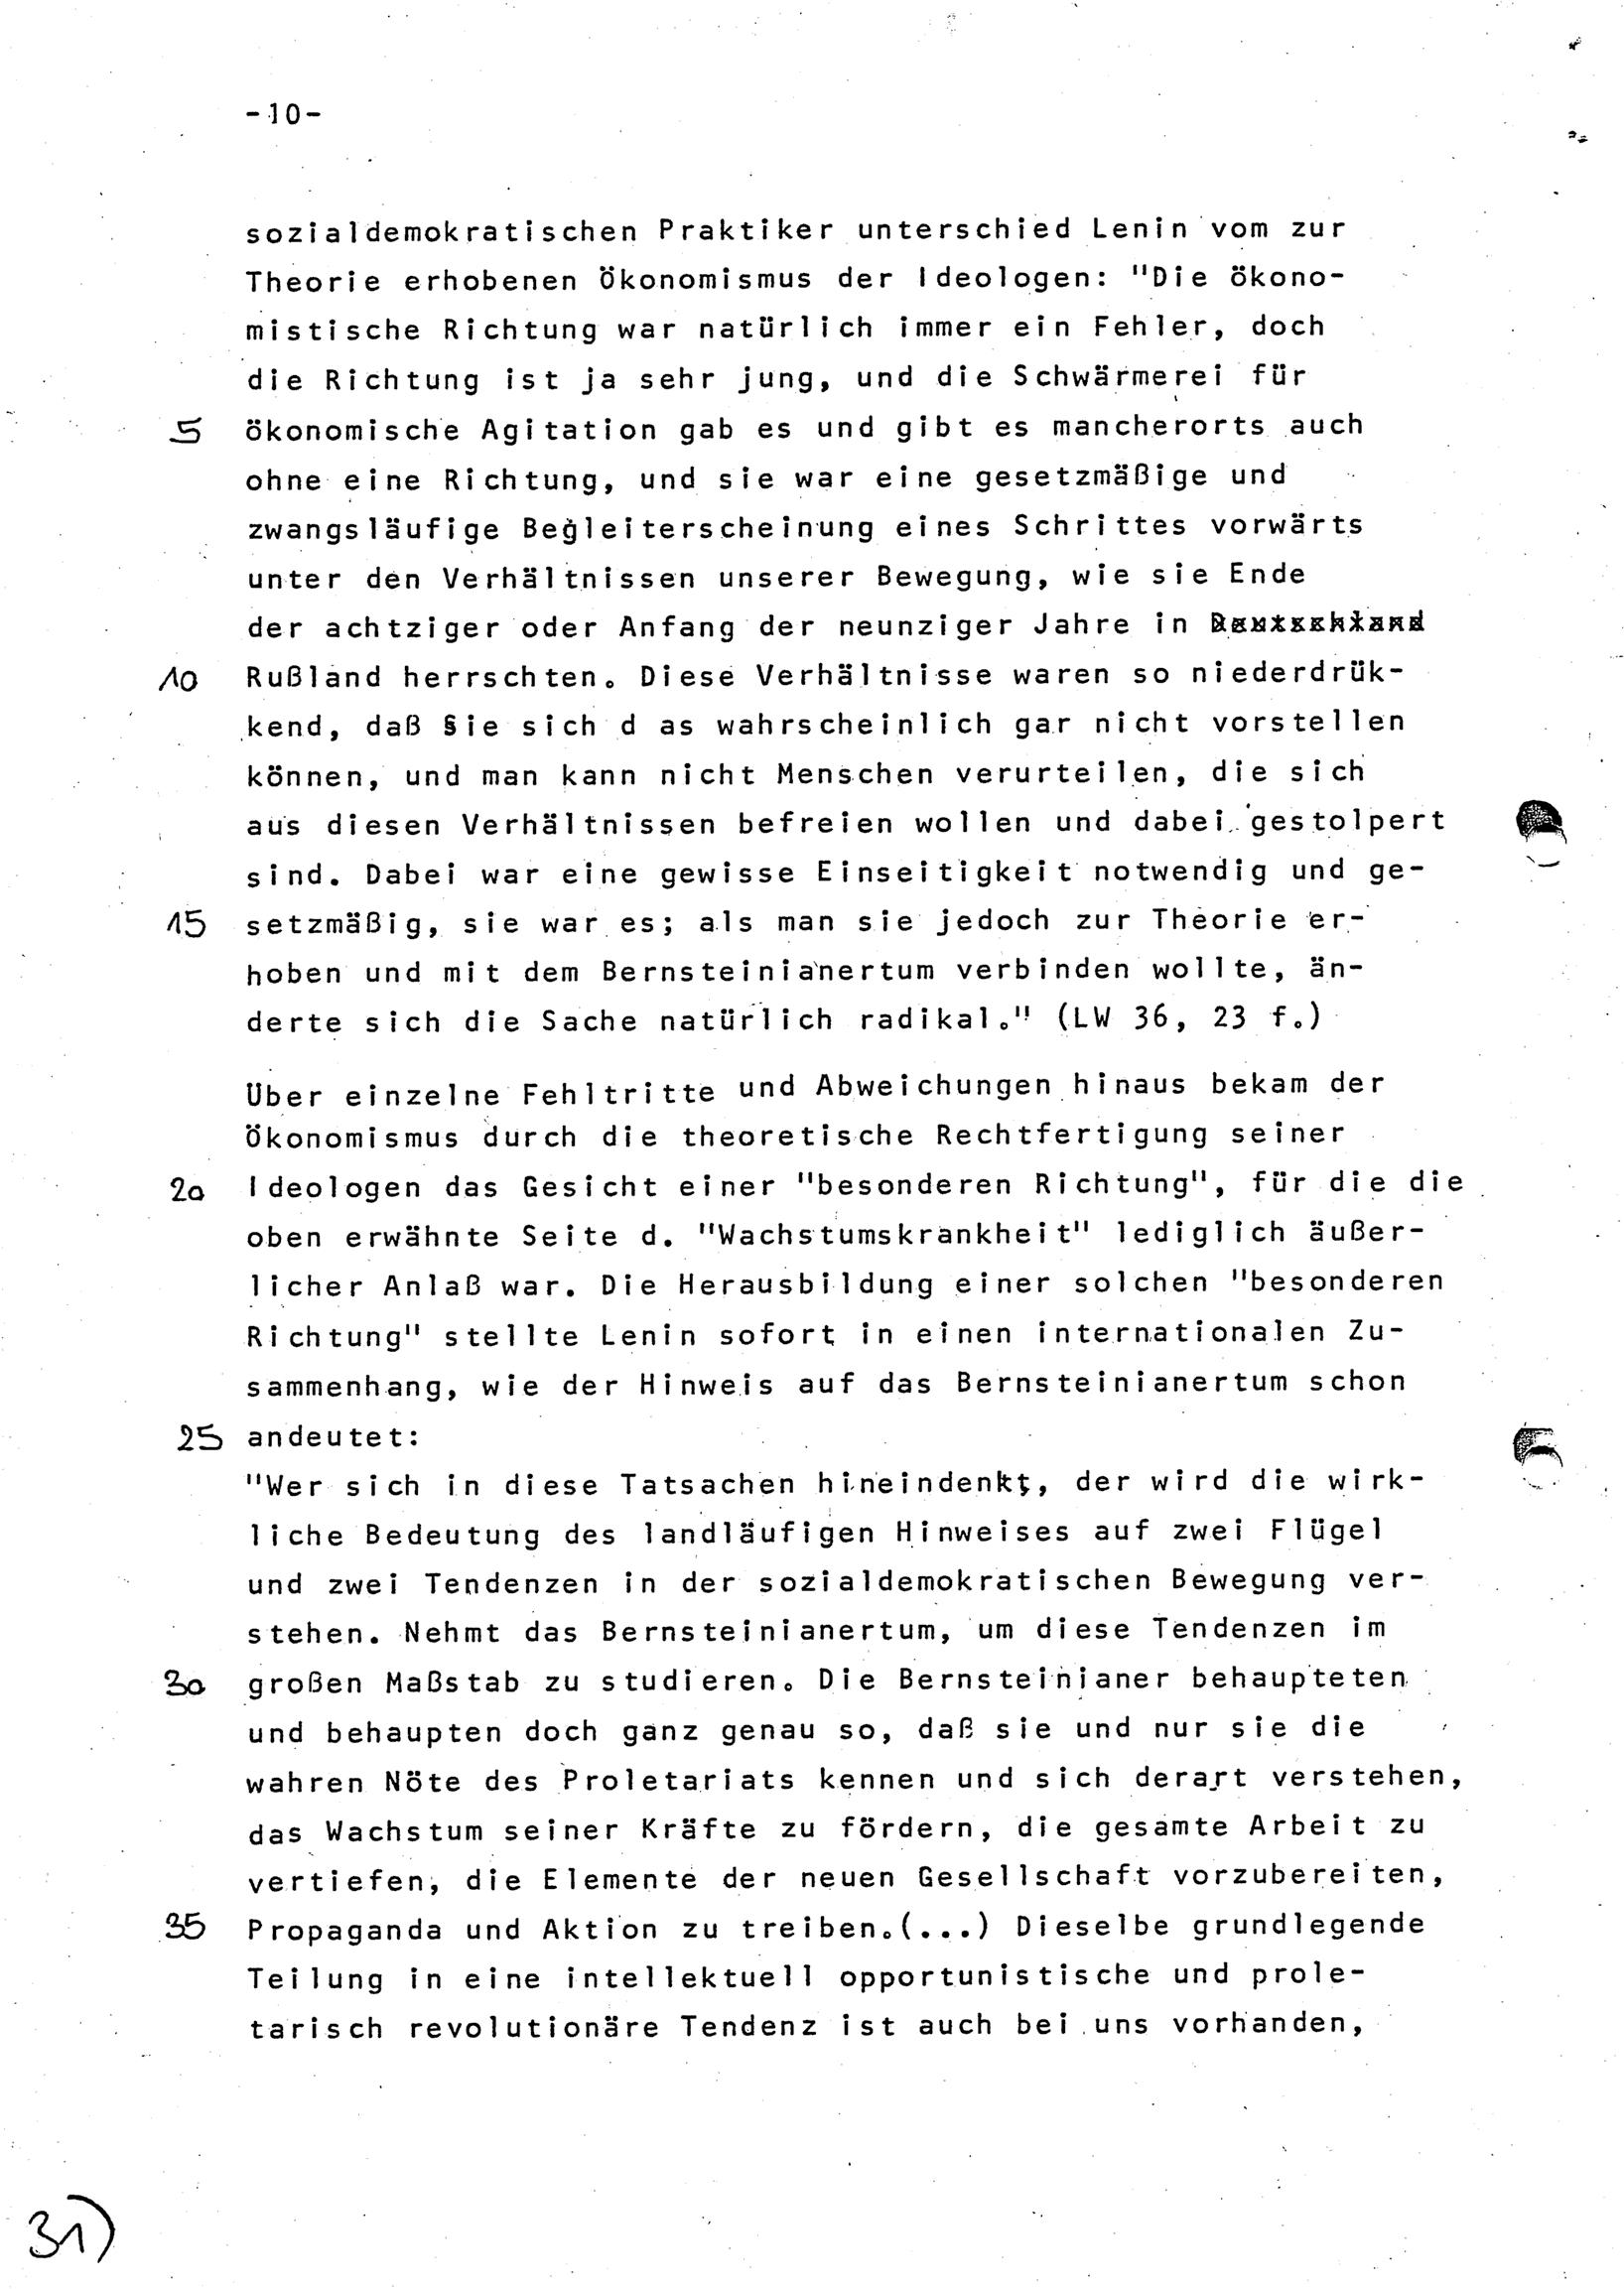 Ulm_KGU_Arbeitsheft_19830425_015_034